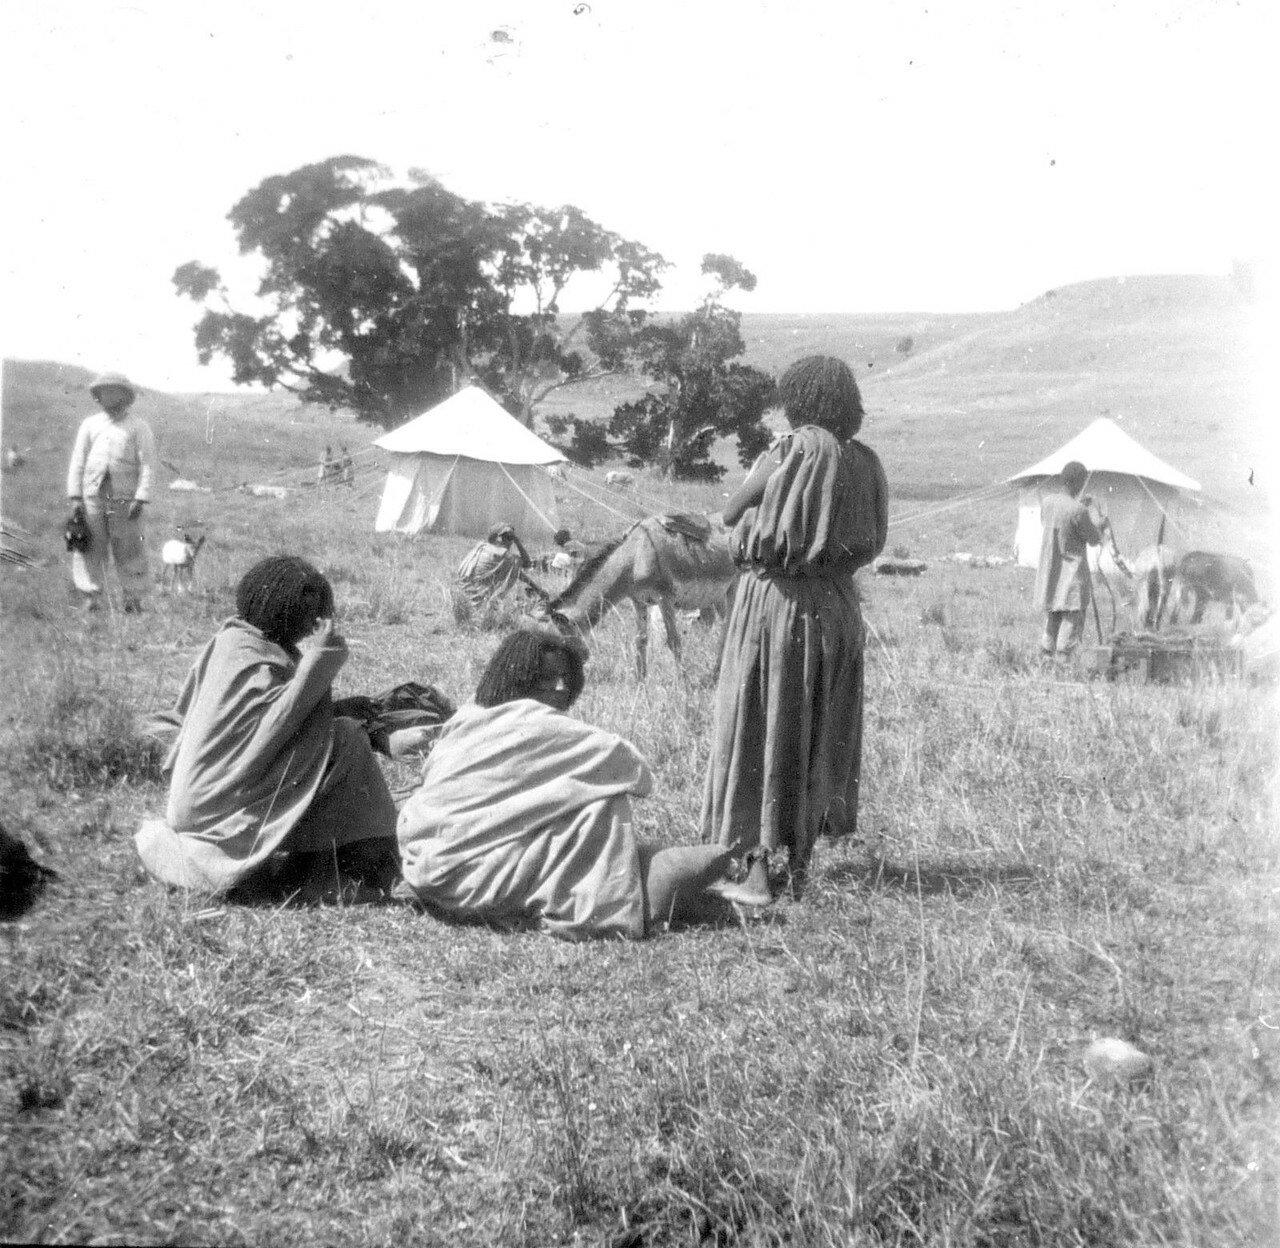 1897. Абиссиния.  Лагерь Чефедонза на дороге Джибутти - Аддис-Абеба